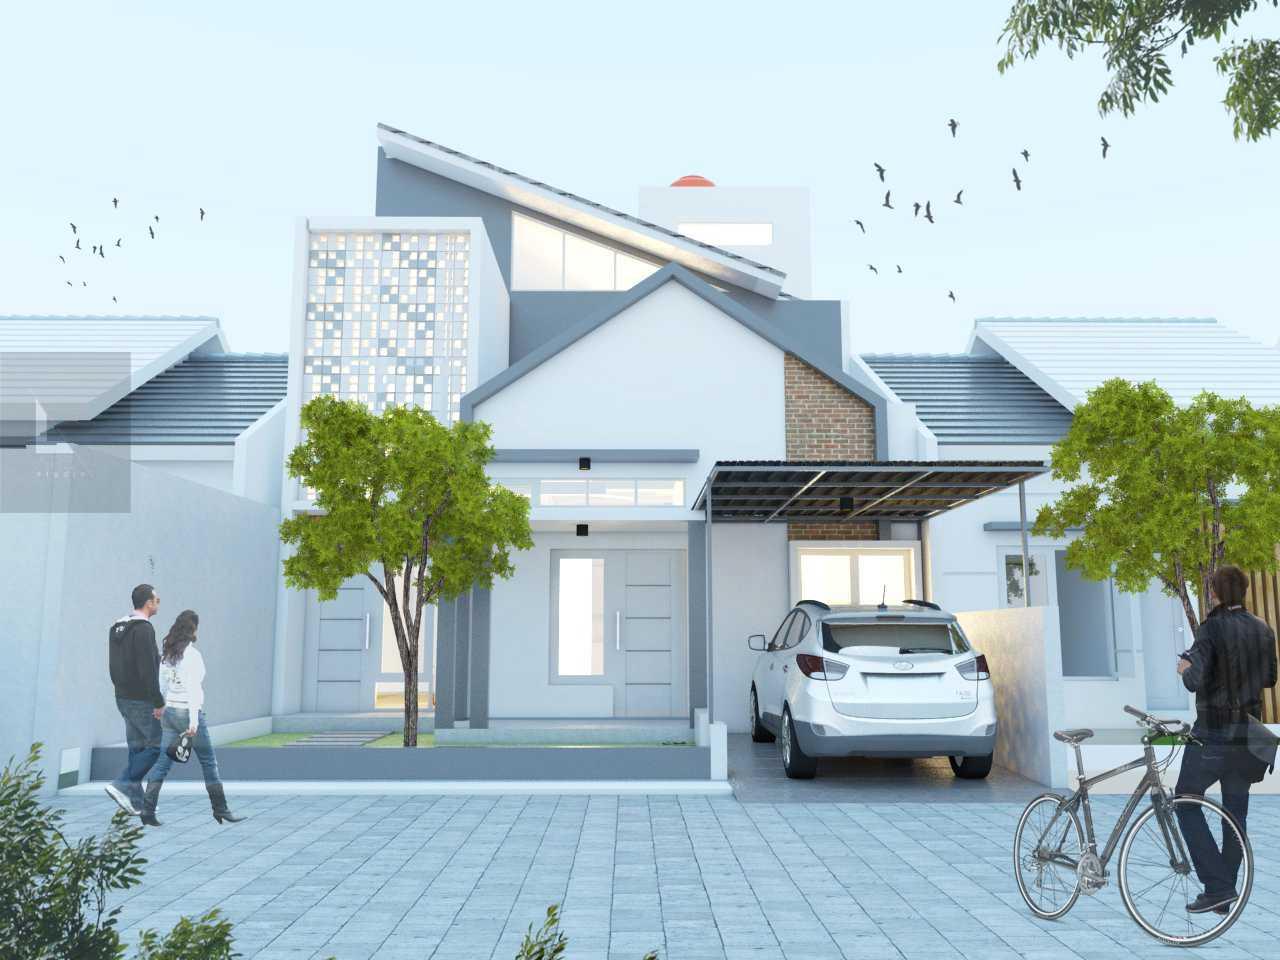 Jasa Arsitek ARZ STUDIO di Malang